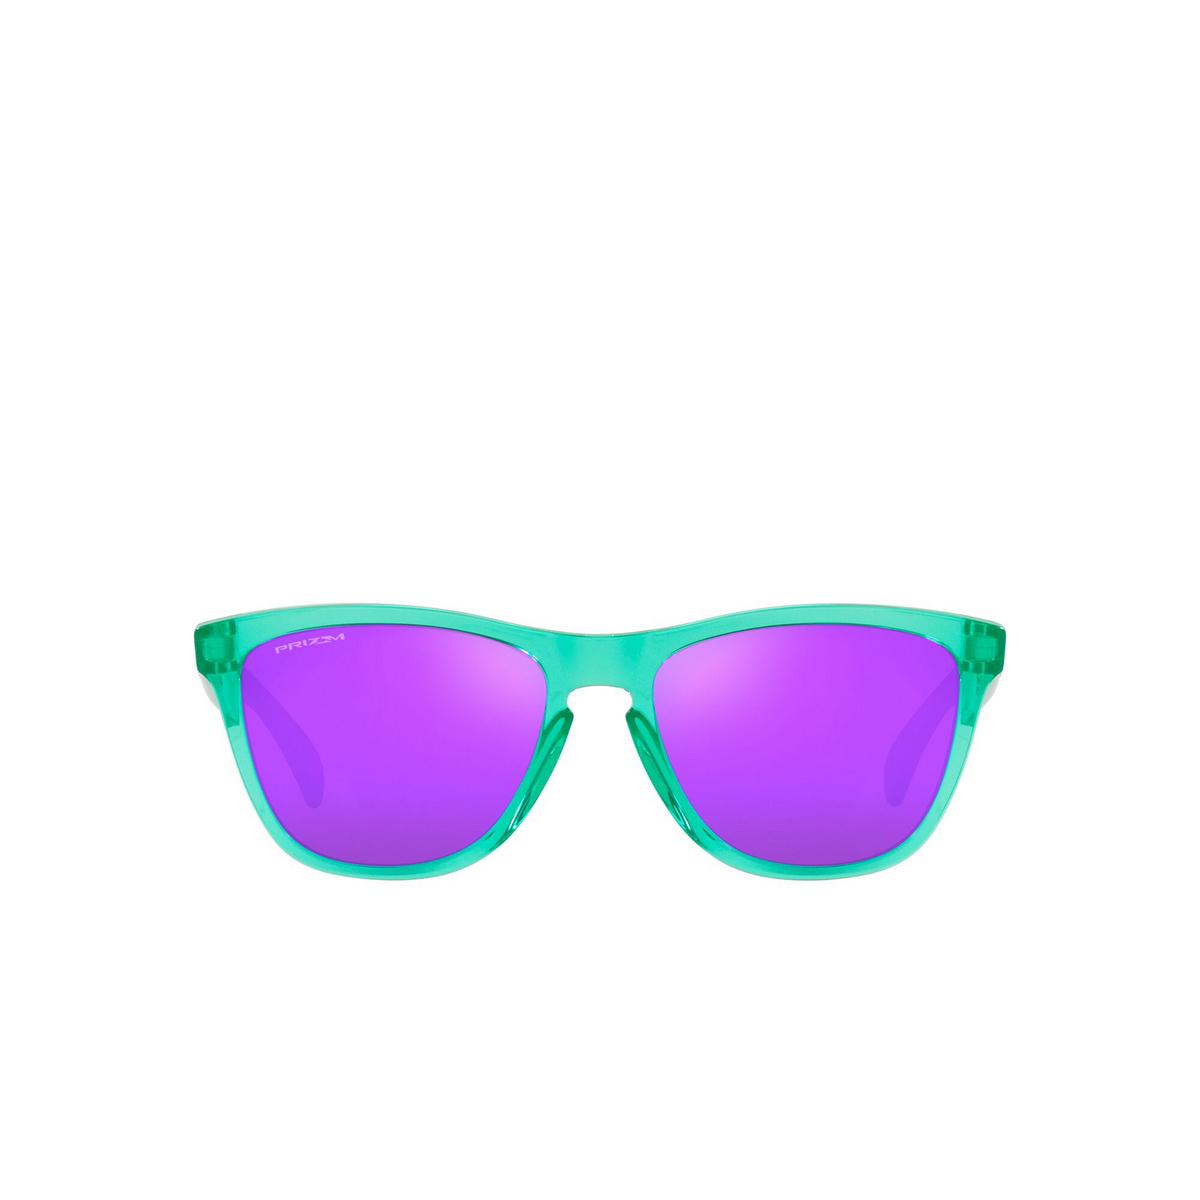 Oakley® Square Sunglasses: Frogskins OO9013 color Translucent Celeste 9013J8 - front view.